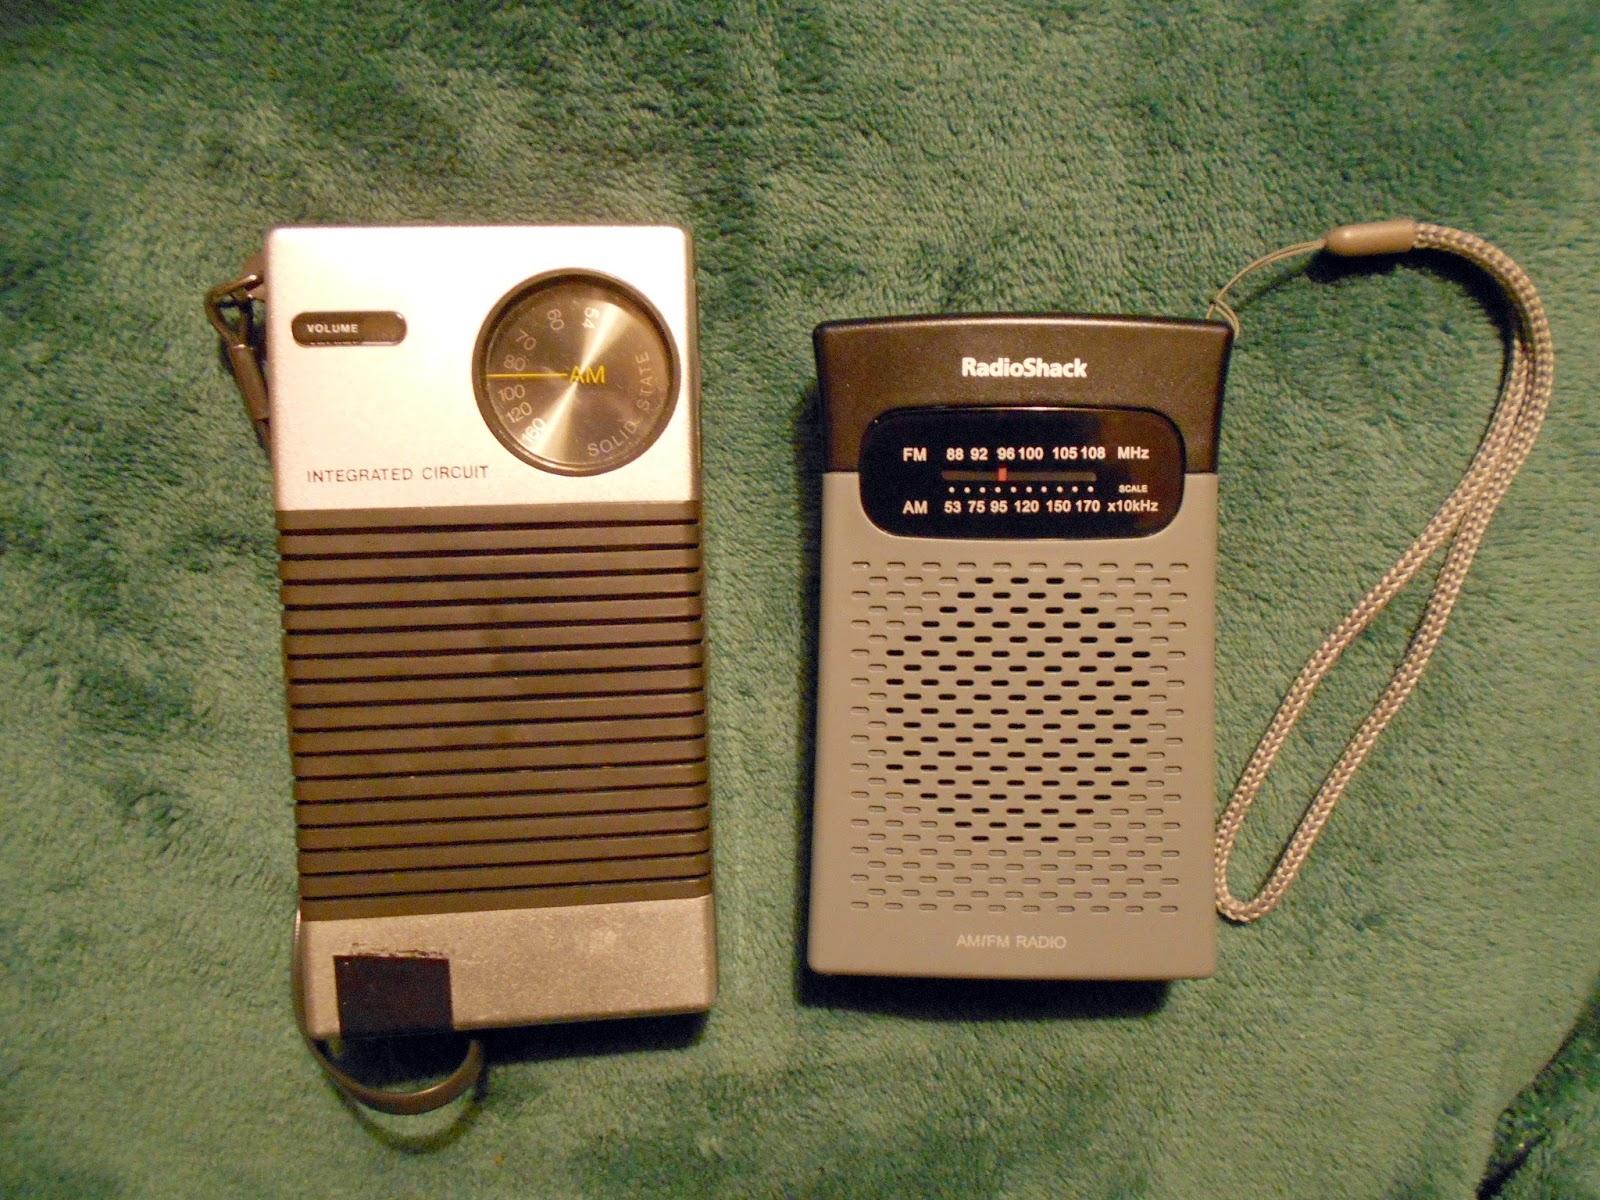 Interrock Nation Radio Shack 120 586 Pocket A Sleeper Mw One Chip Am Receiver Long Distance